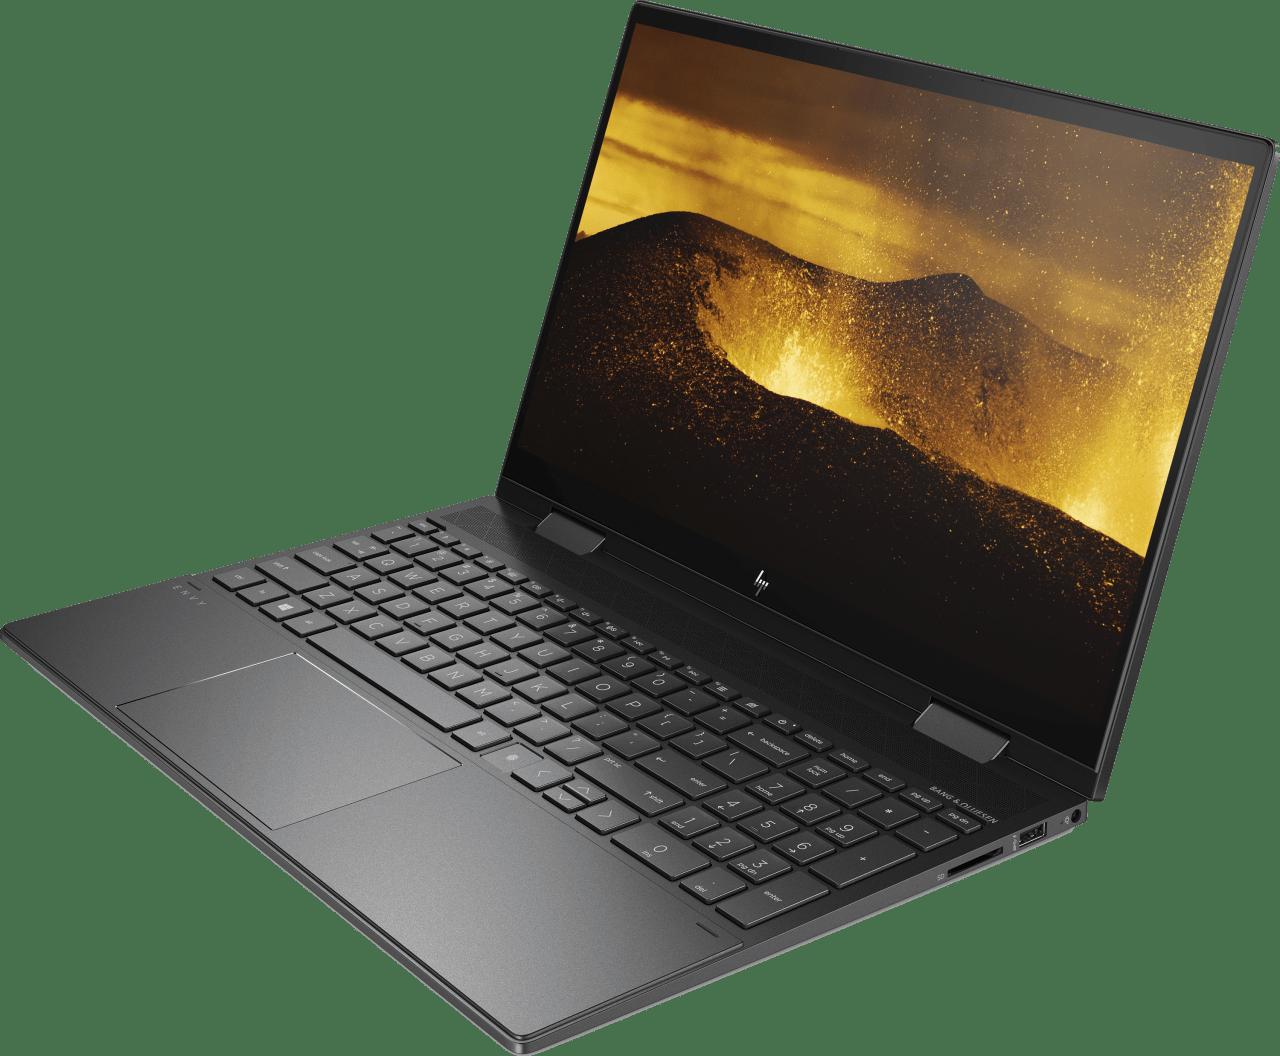 Nightfall Black HP Envy x360 15-ee0265ng 2in1 - AMD Ryzen™ 7 4700U - 8GB - 512GB PCIe - AMD Radeon Vega Graphics.2